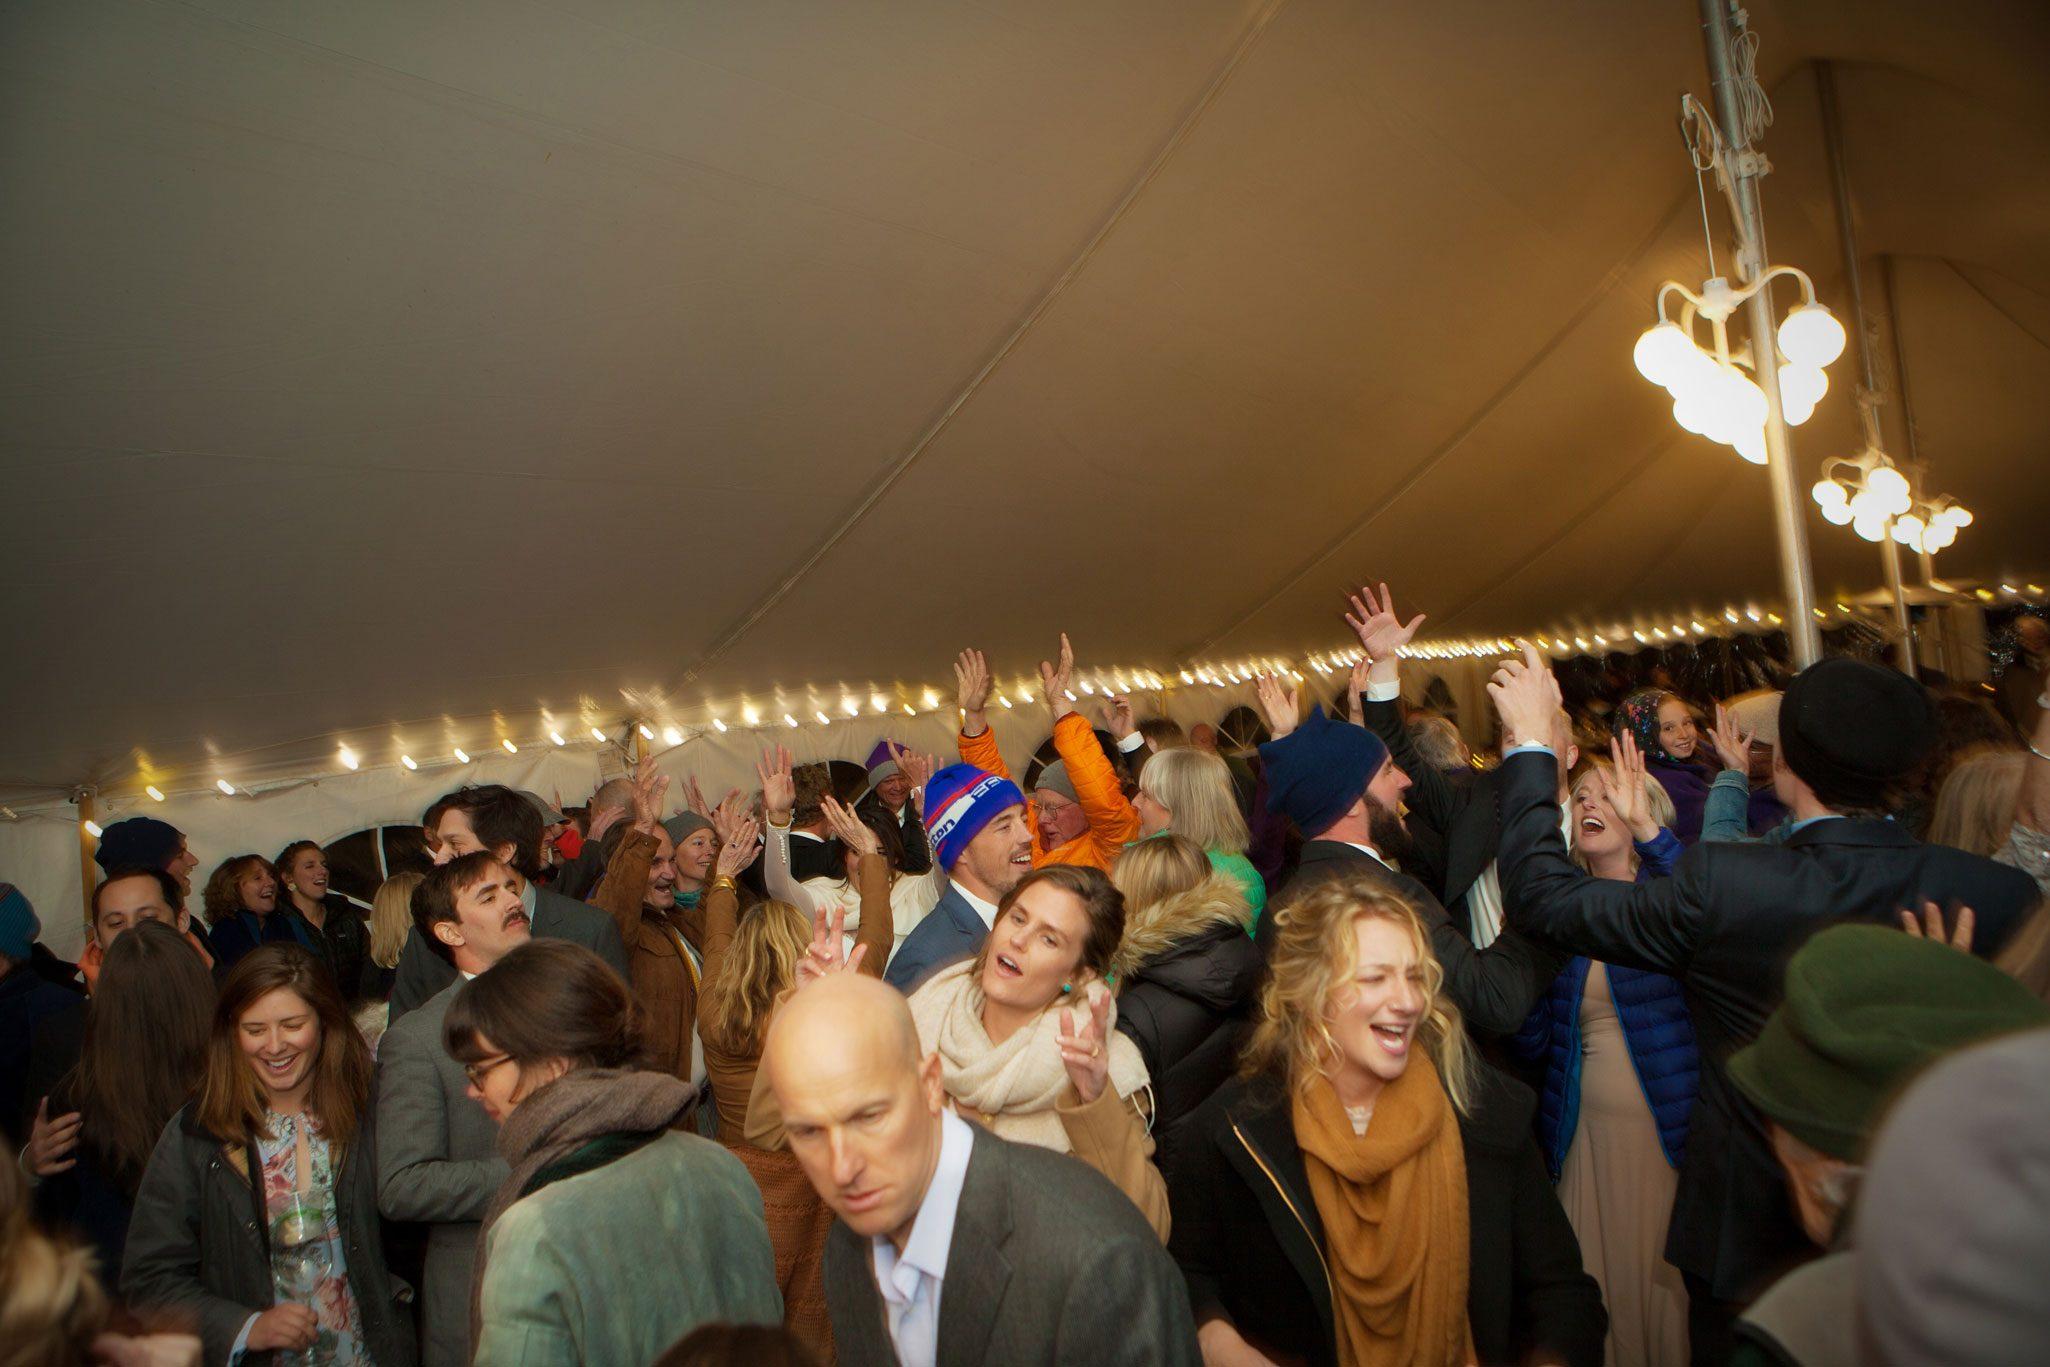 Dance party under a tent